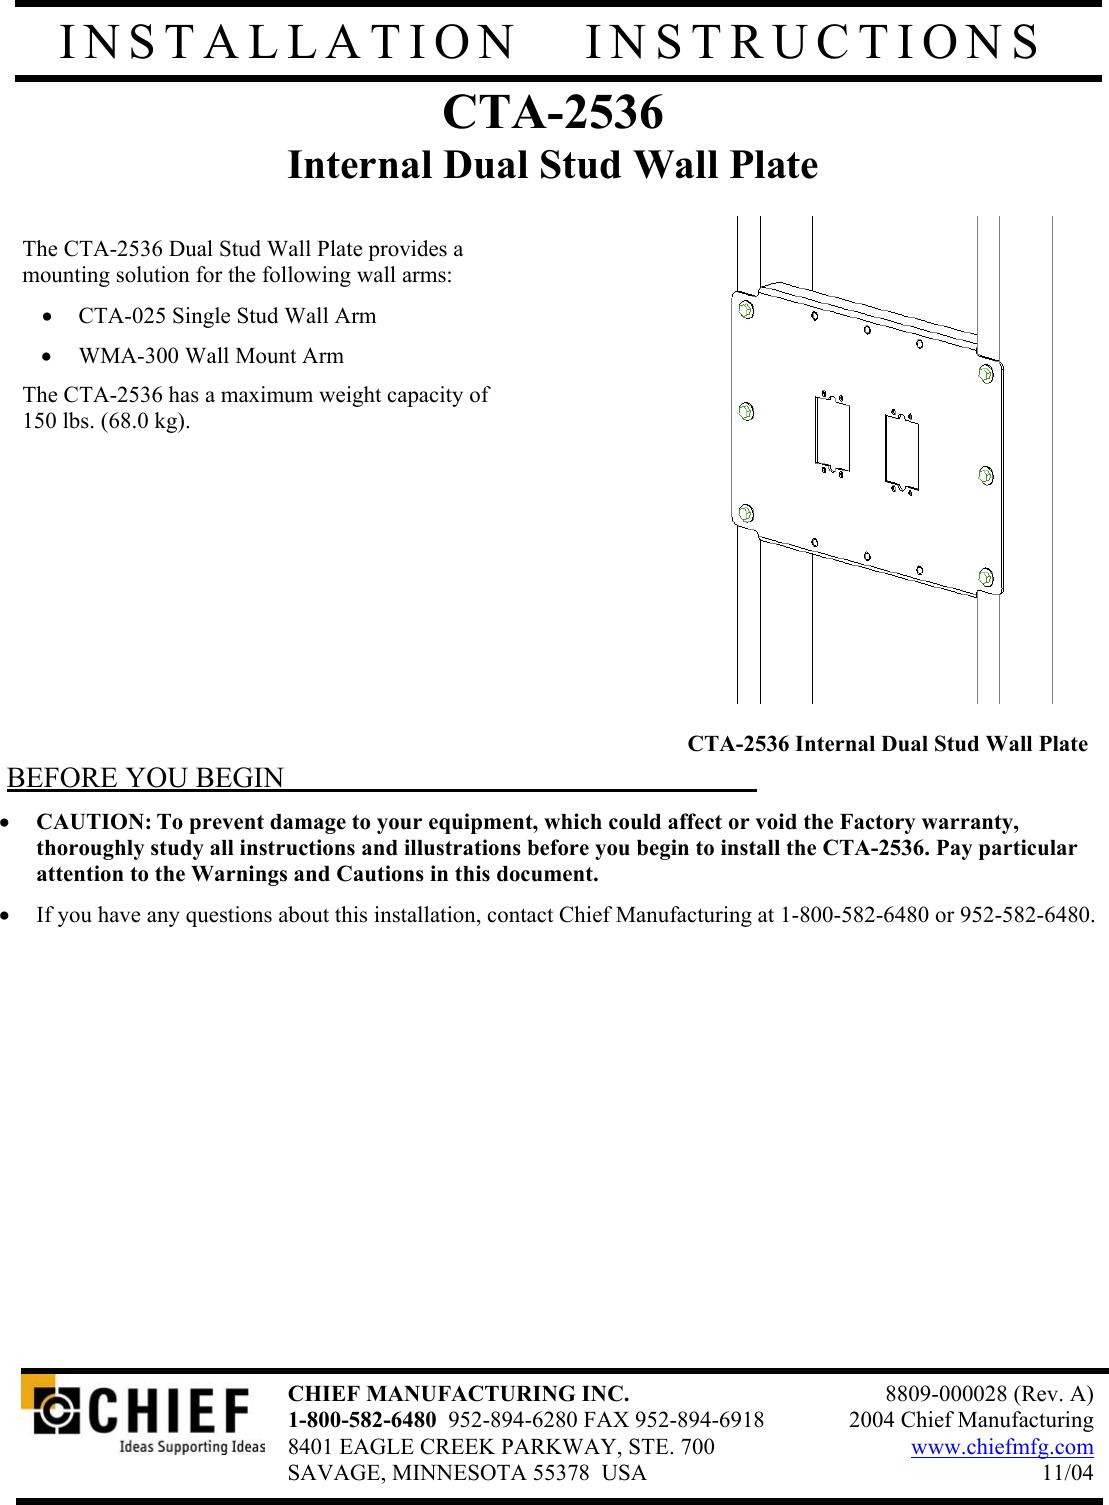 chief manufacturing cta 2536 users manual cta2536 installation rh usermanual wiki Manual Manufacturing Process Manufacturing Manual Labor